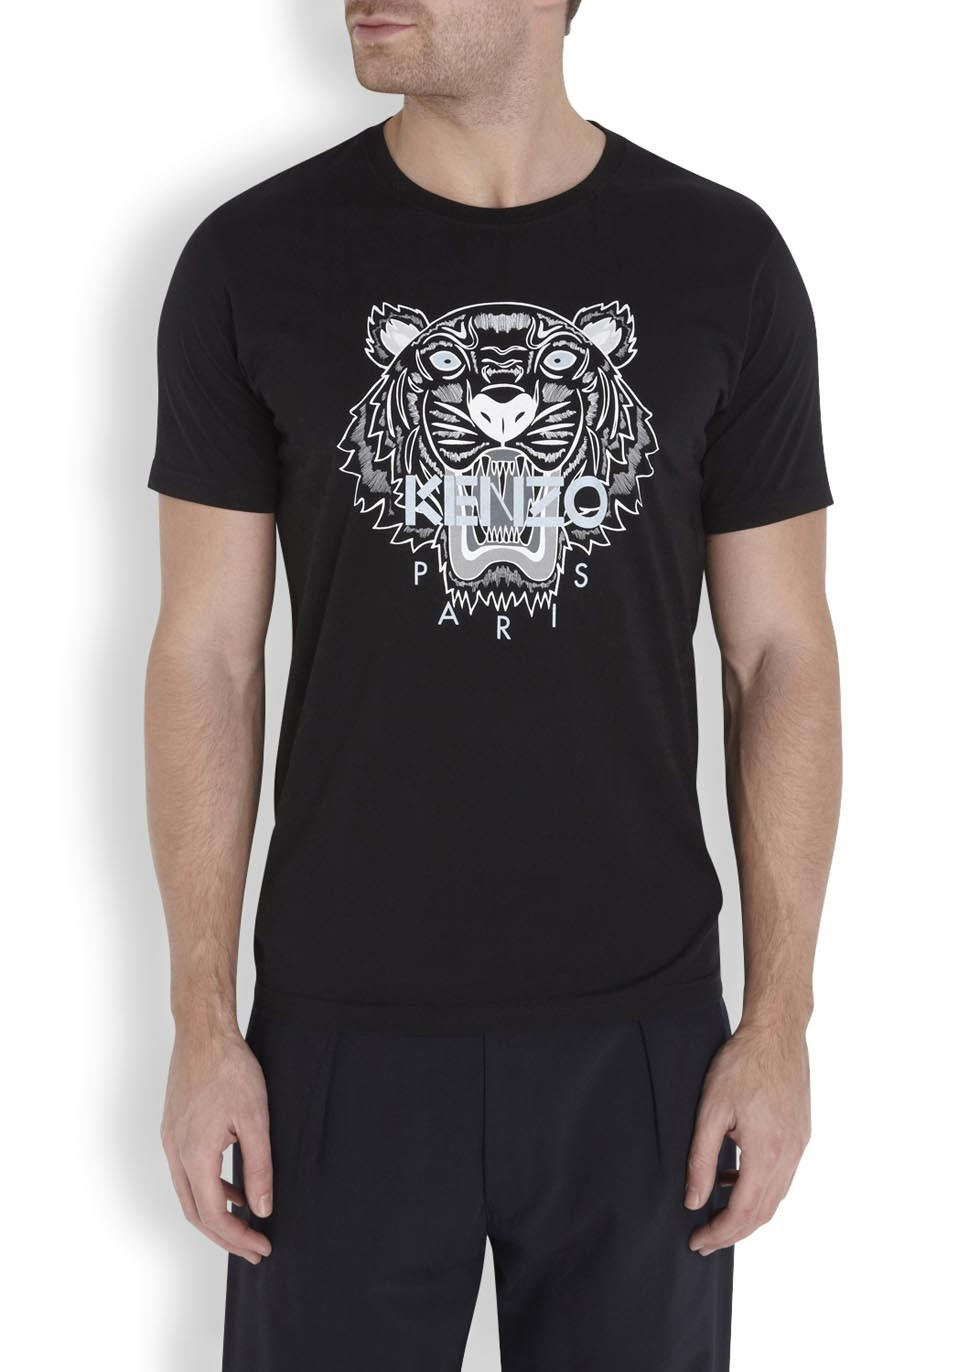 kenzo black embroidered tiger round neck t shirt in black for men lyst. Black Bedroom Furniture Sets. Home Design Ideas